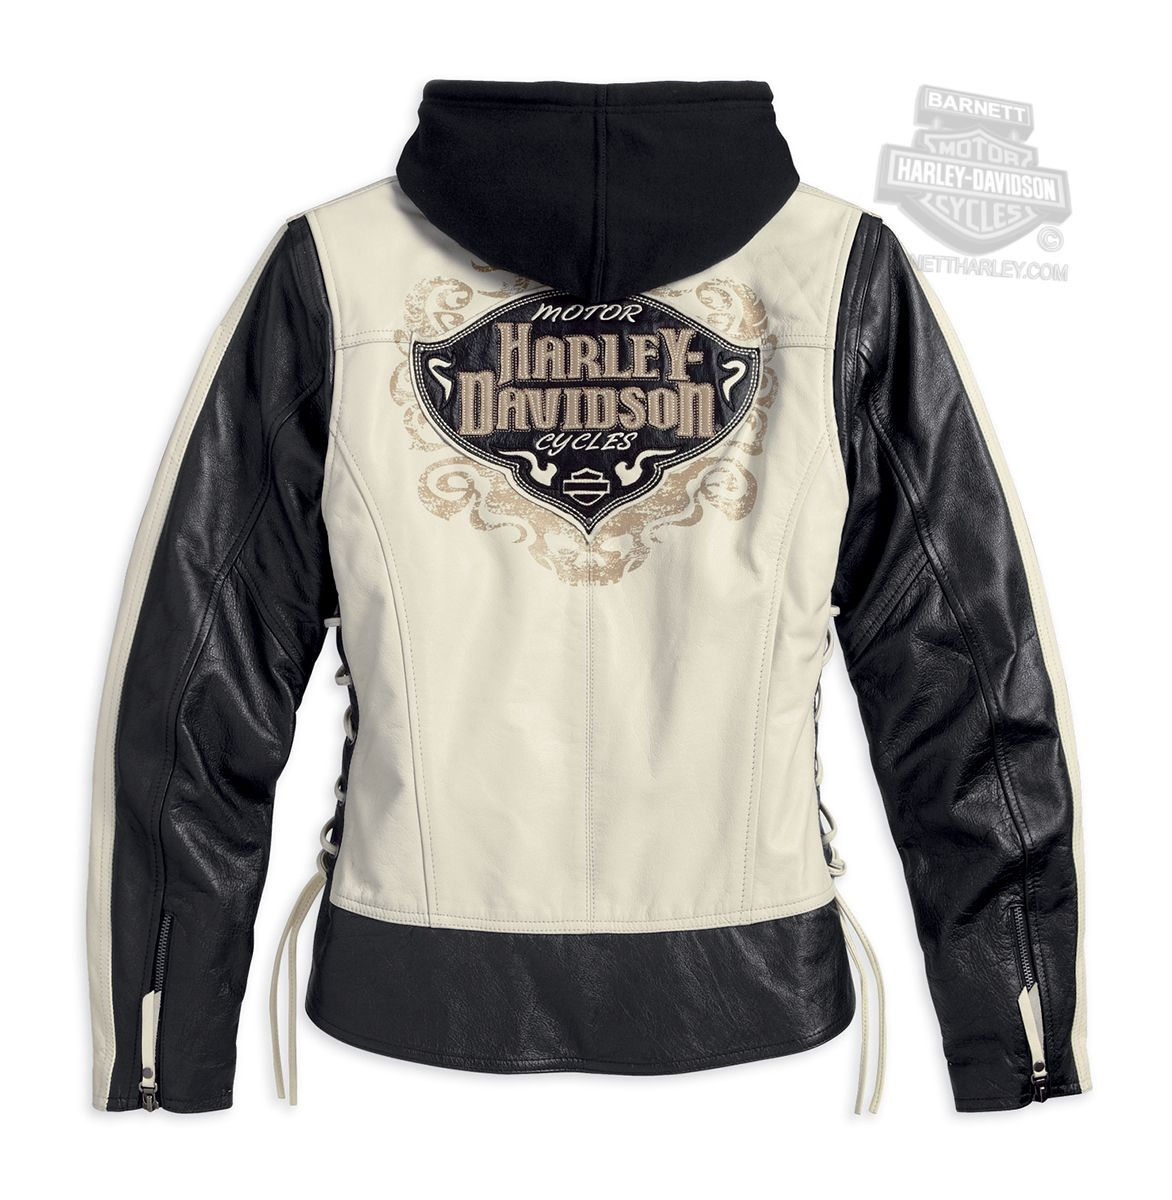 Harley Davidson Womens Adorned Side Lacing 3 In 1 Colorblocked Black Leather Jacket Leather Jacket Hoodie Black Leather Jacket Harley Davidson Women [ 1200 x 1172 Pixel ]